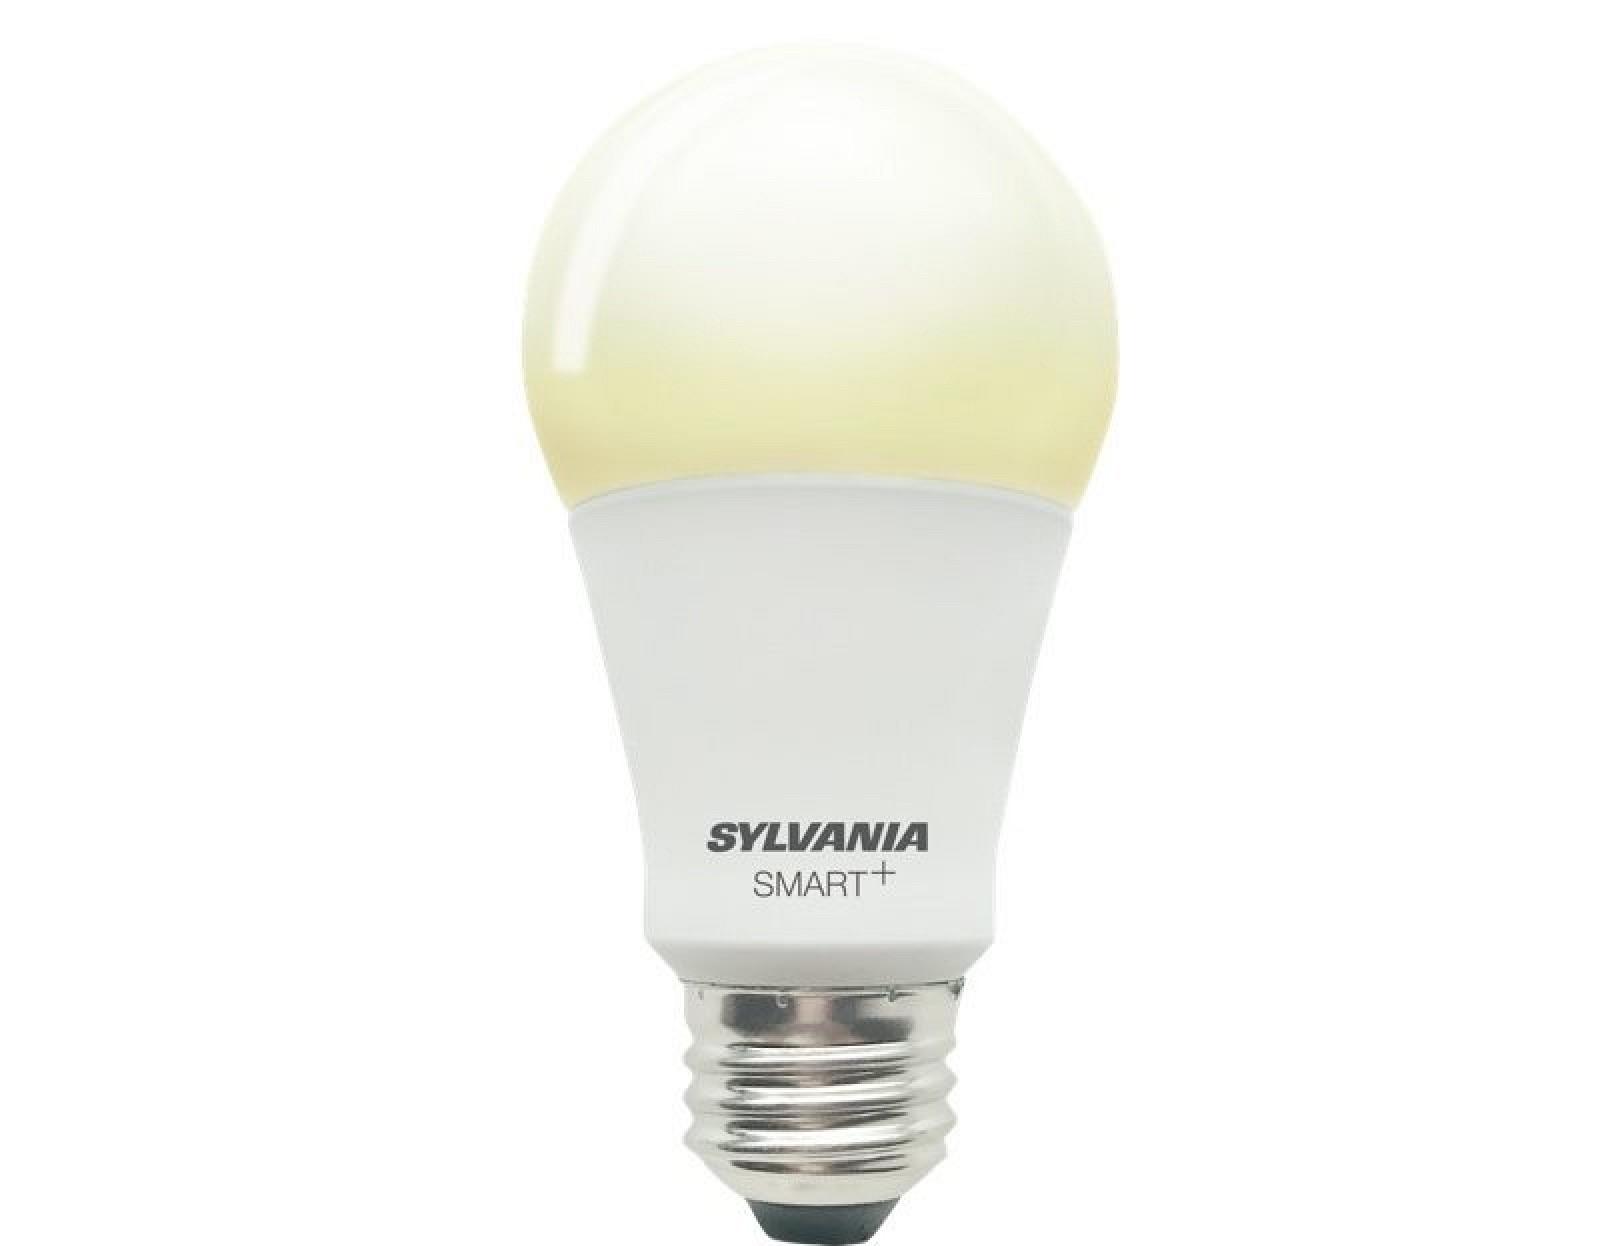 Sylvania Smart Lighting Line Gains Homekit Enabled Flex Strip And Soft White Bulb Mac Rumors